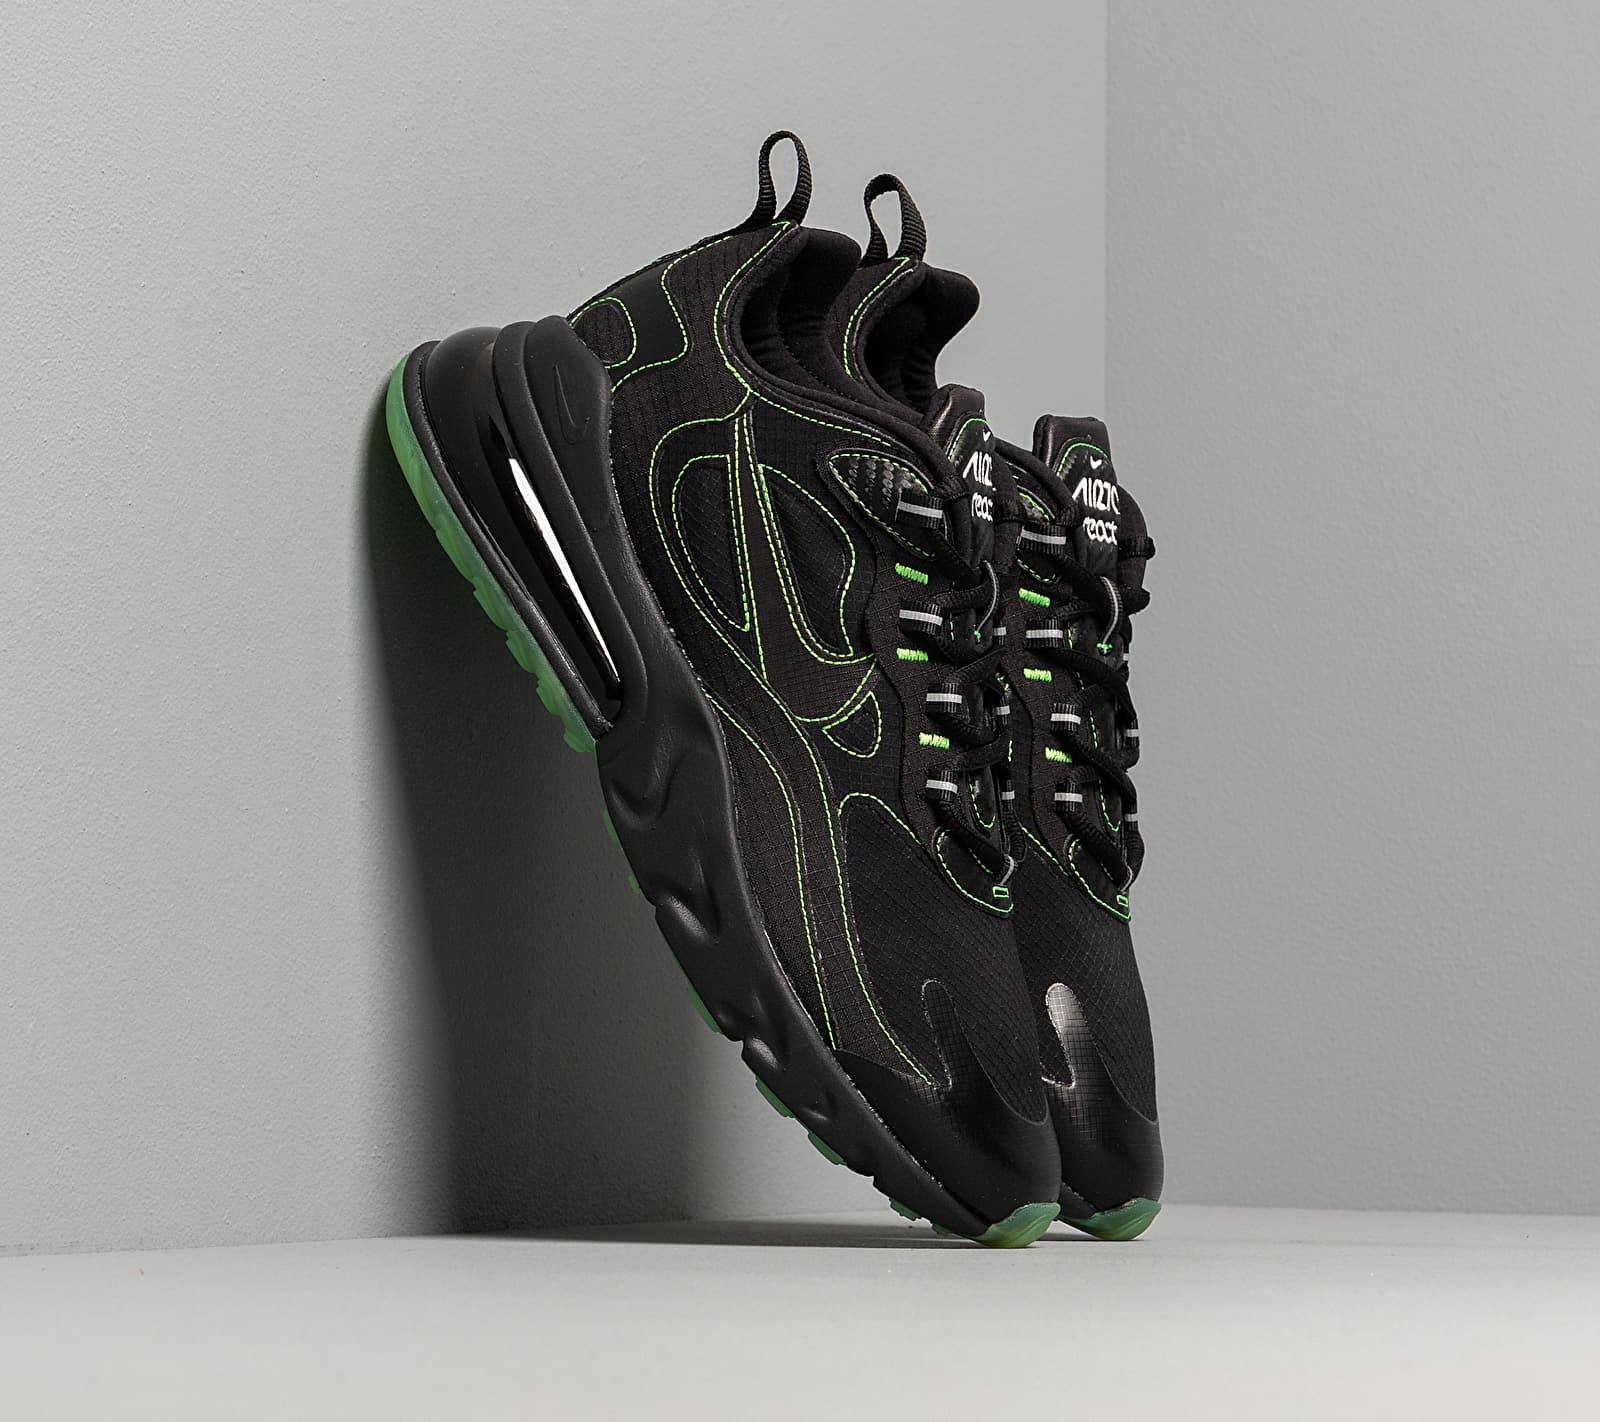 Nike Air Max 270 React Sp Black/ Black-Electric Green EUR 44.5